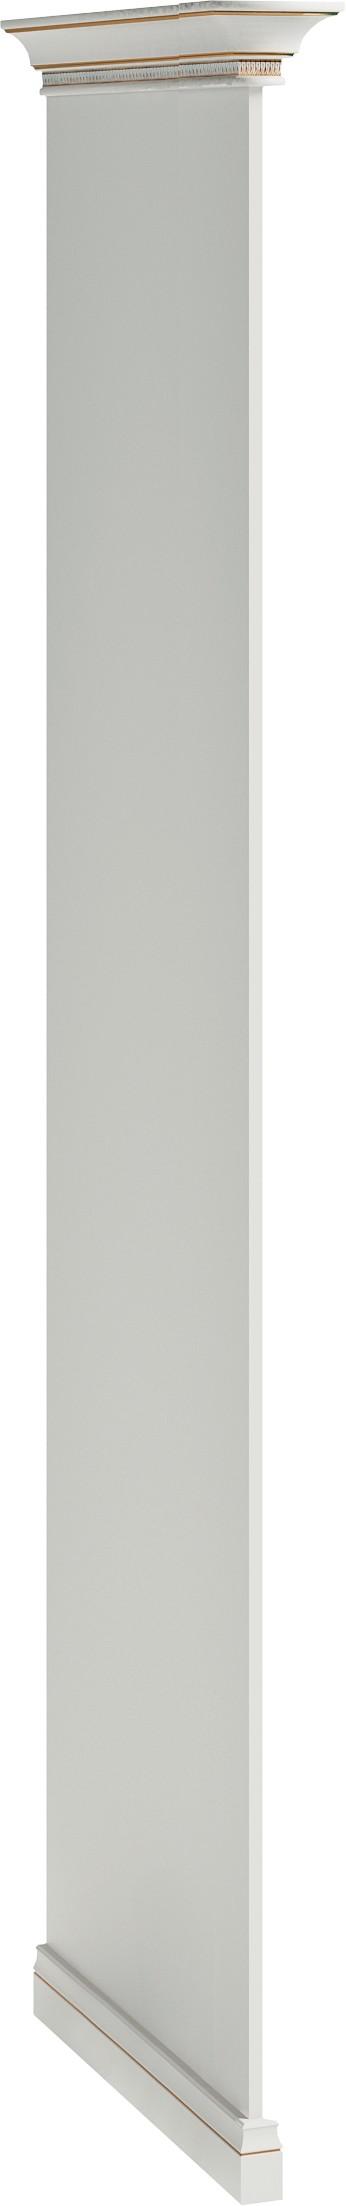 Завършващ елемент за колона V-bok konczacy do kolumny Verona - арт мебели естествено дърво